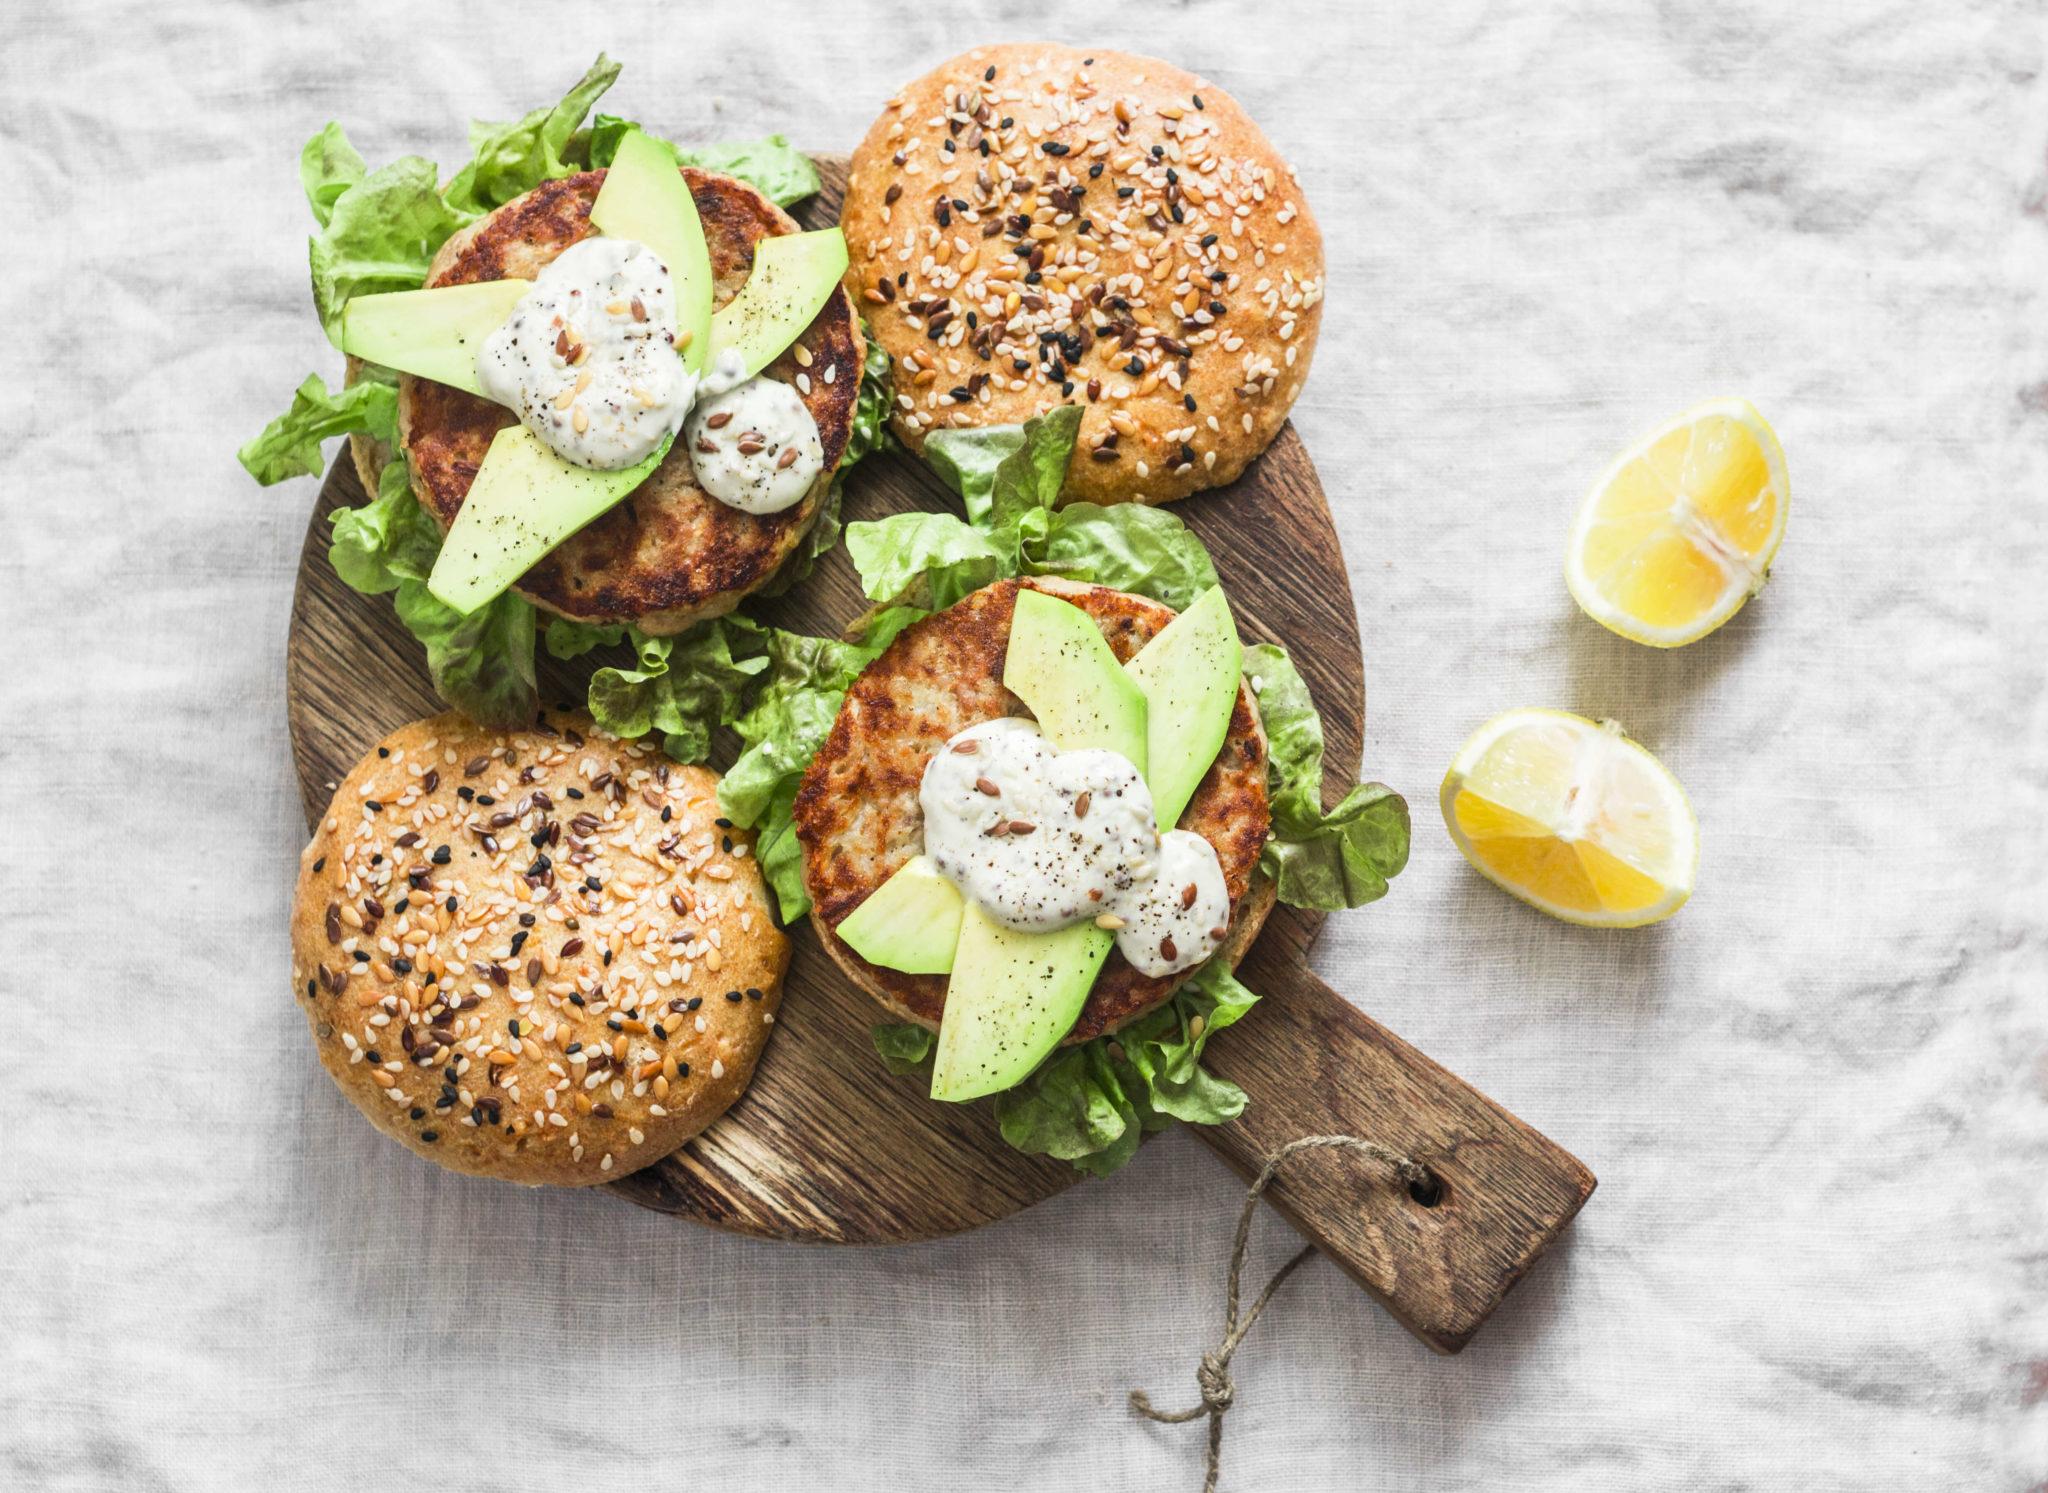 Upfit Blumenkohl-Kichererbsen-Burger